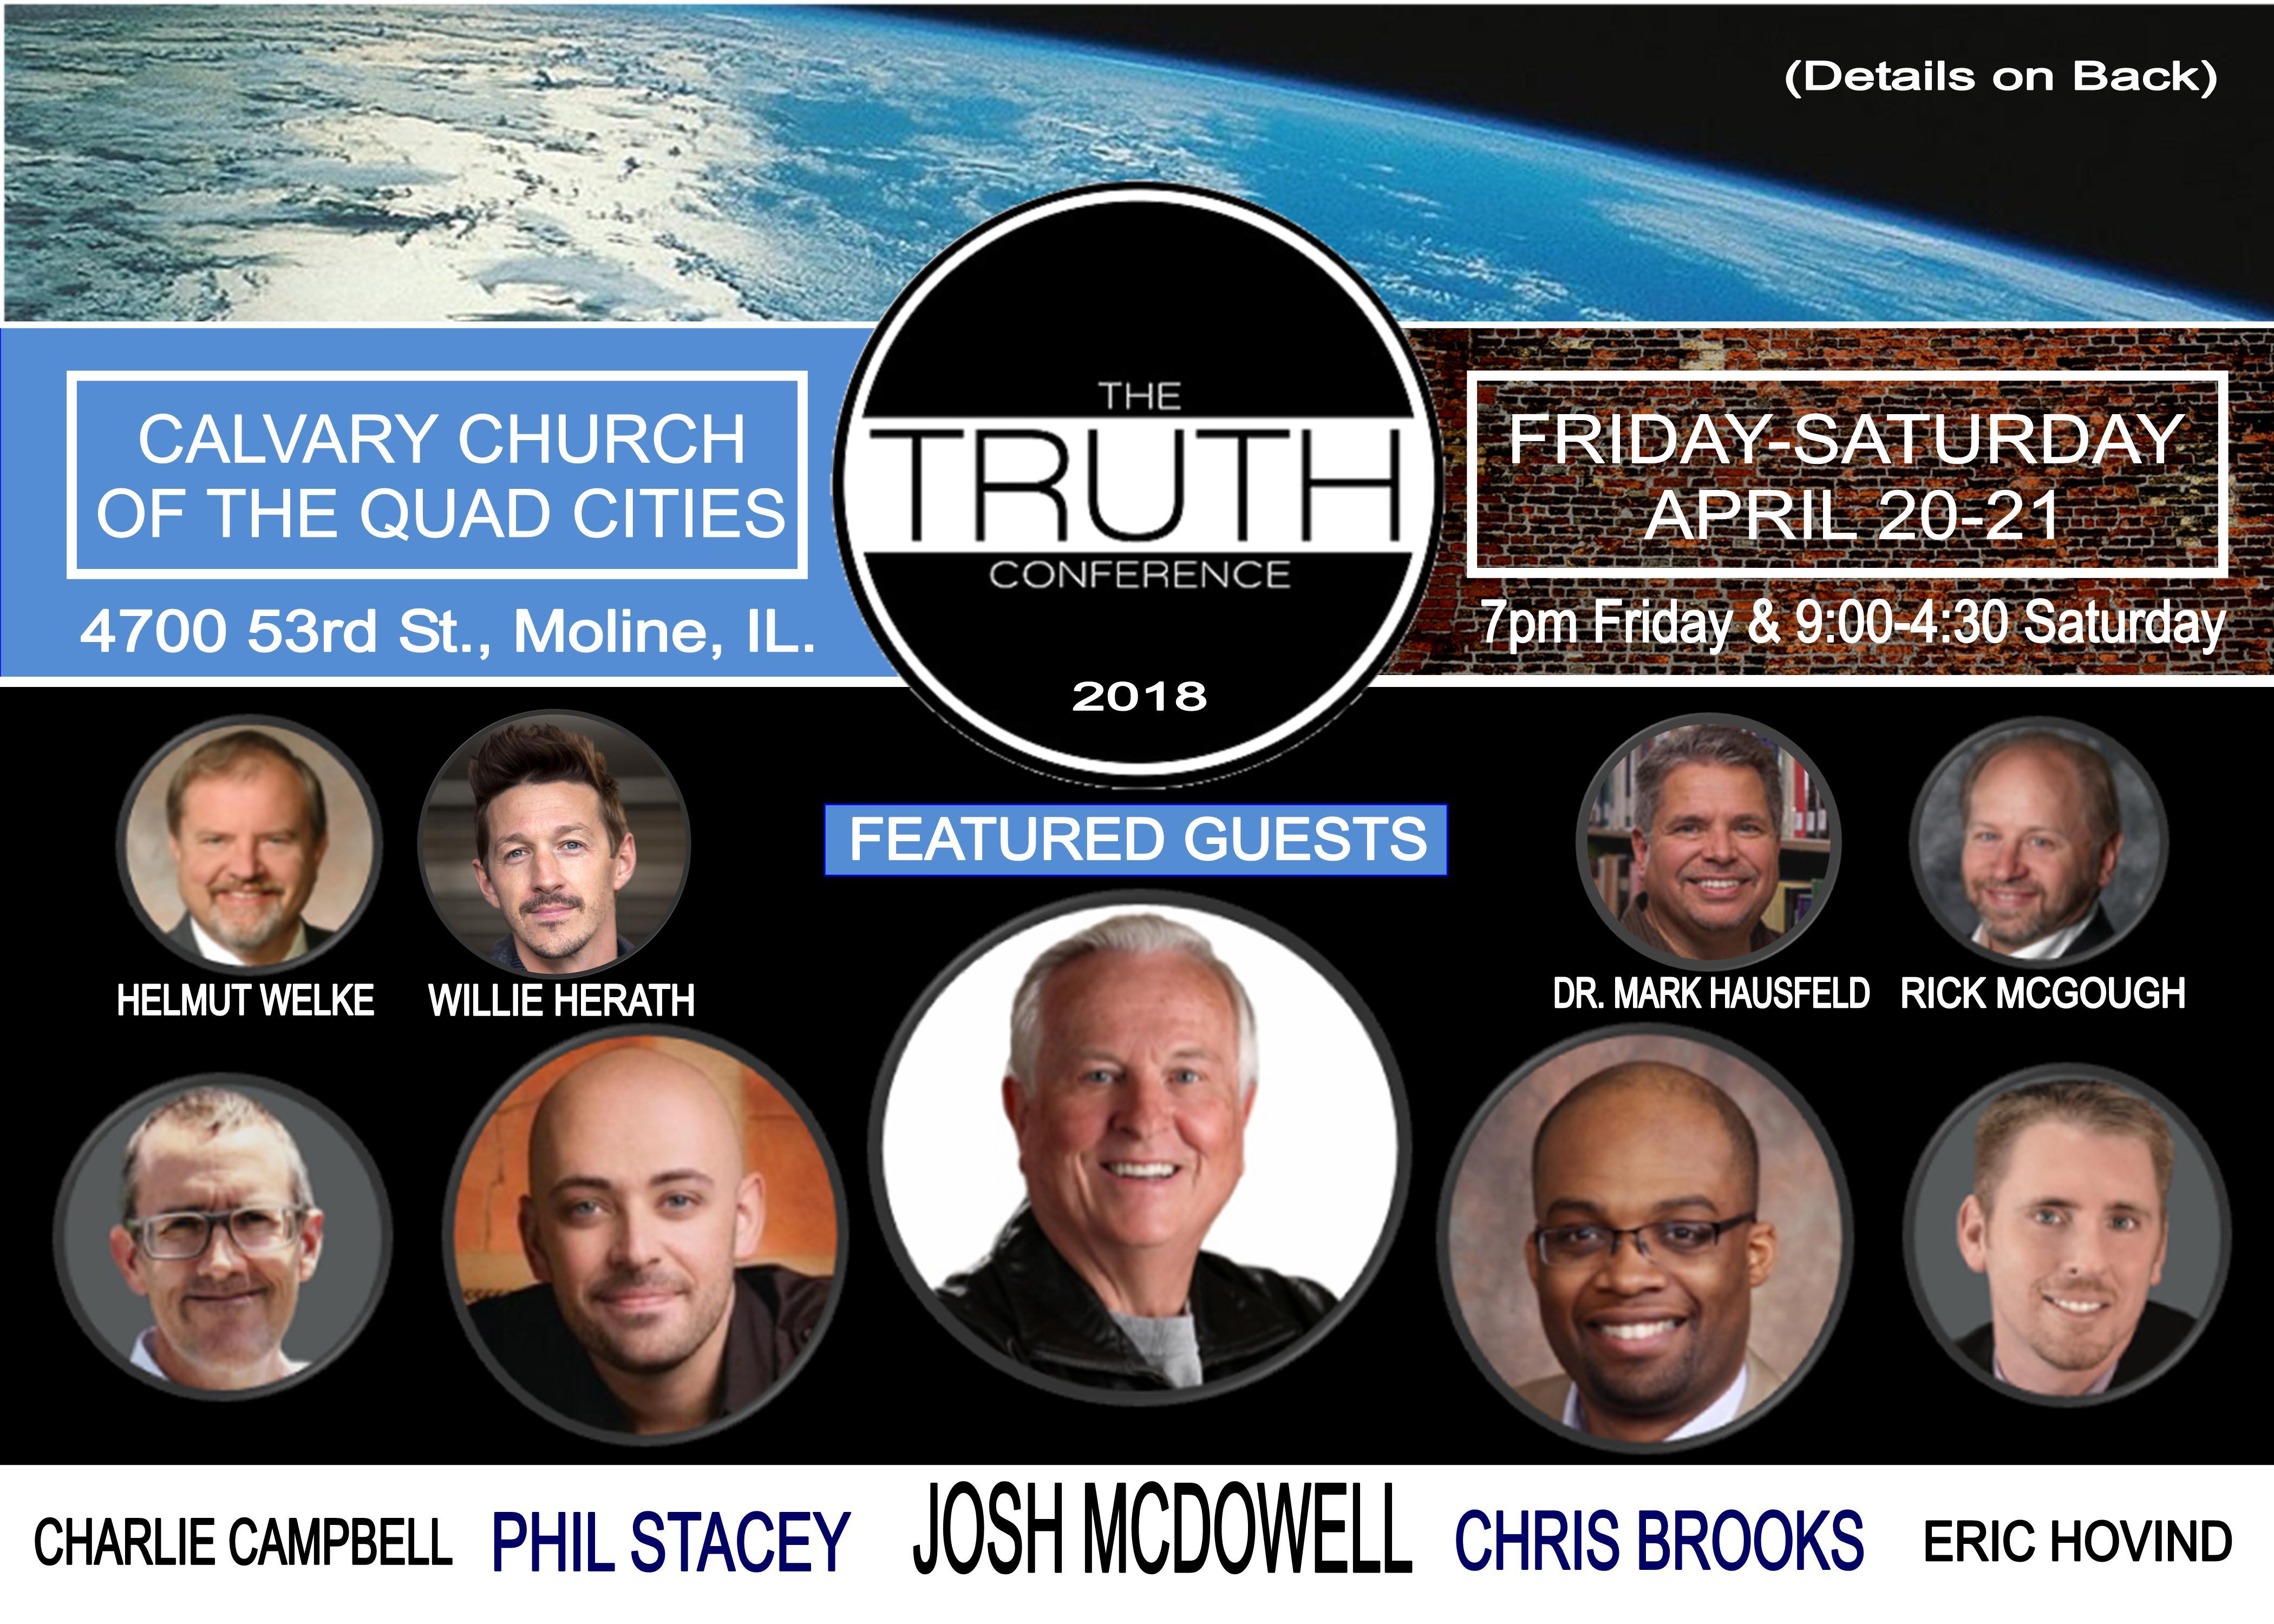 Truth Conference Slide